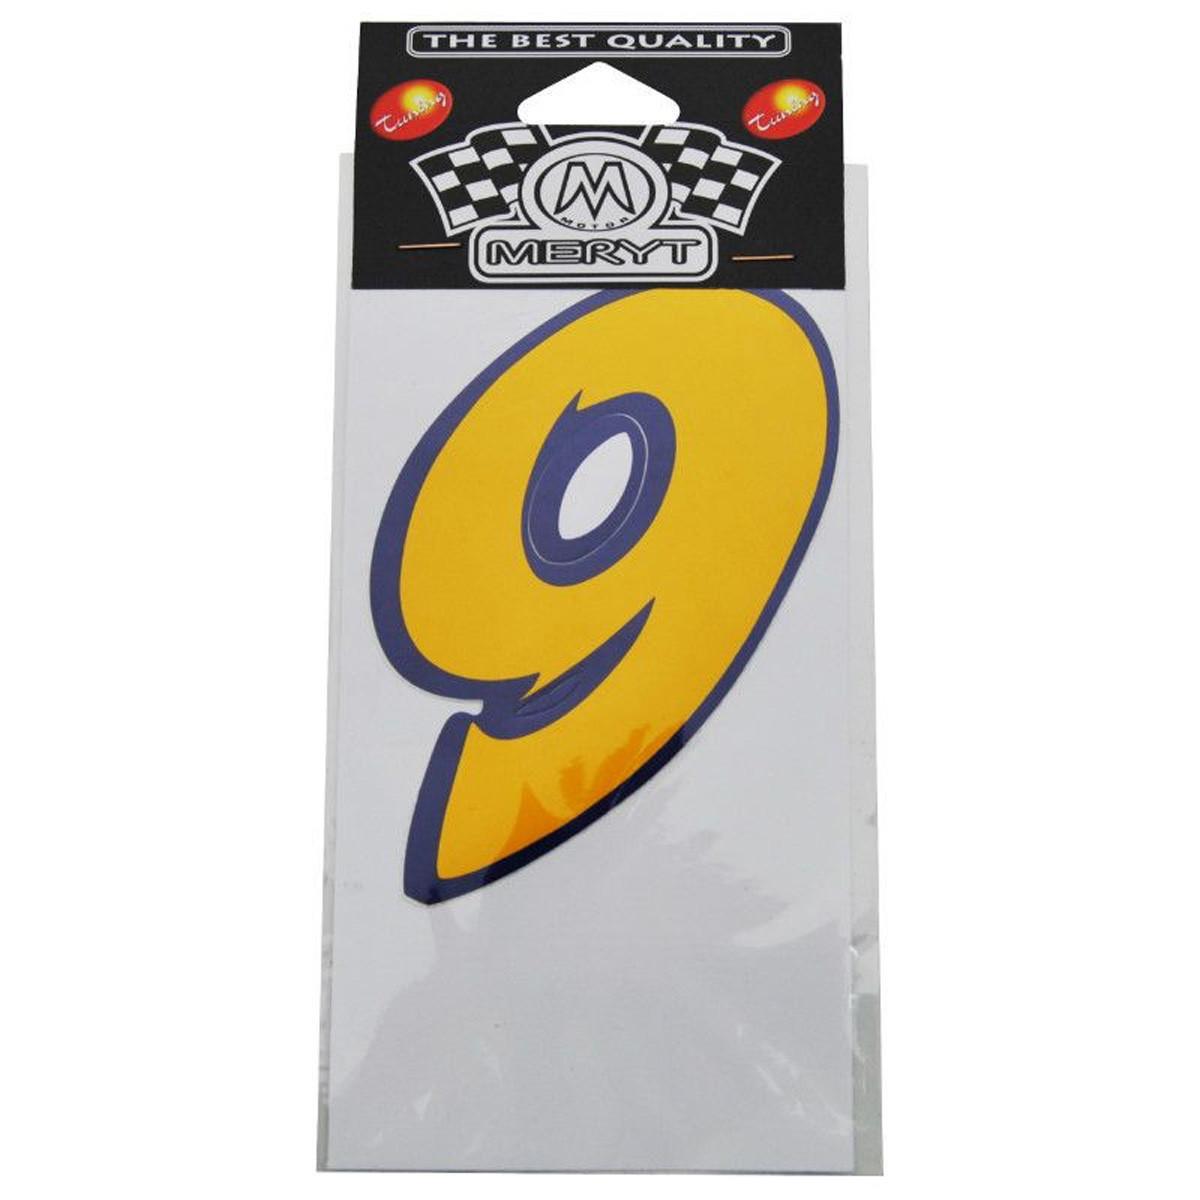 Autocollant / Sticker - MERYT - Numéro 9 - Jaune - H 9 cm